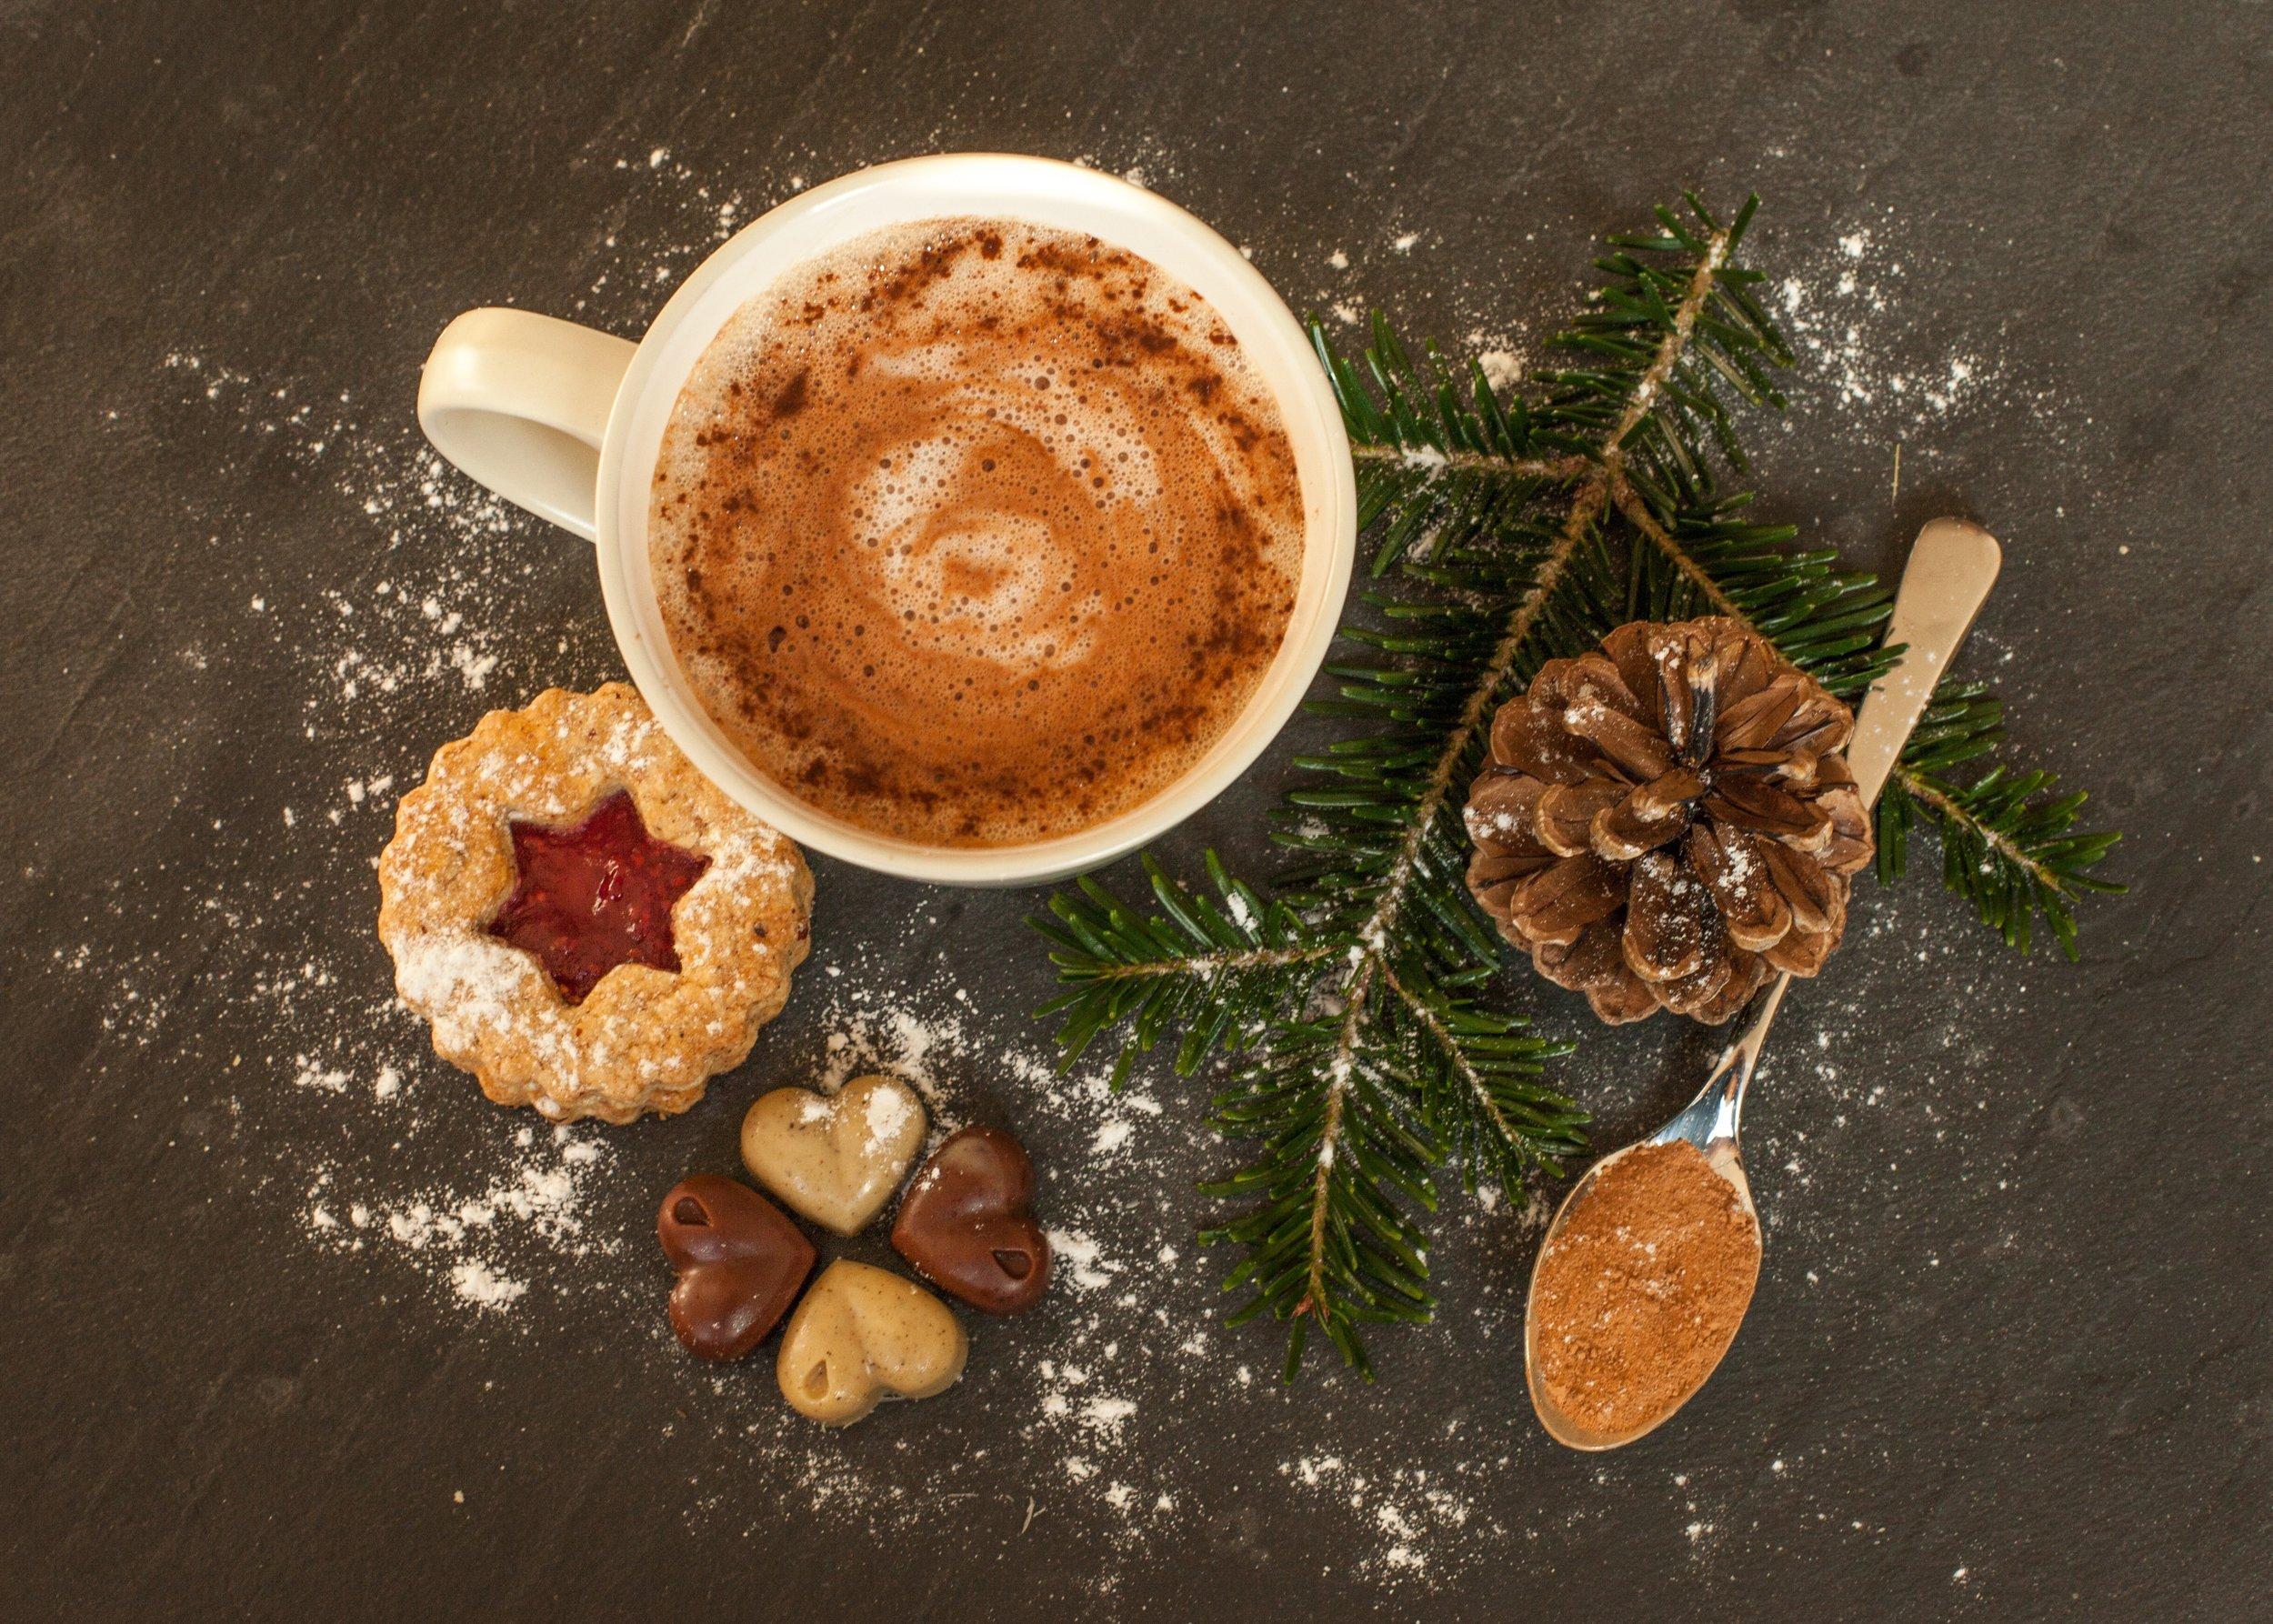 chocolate-chocolates-christmas-221082.jpg